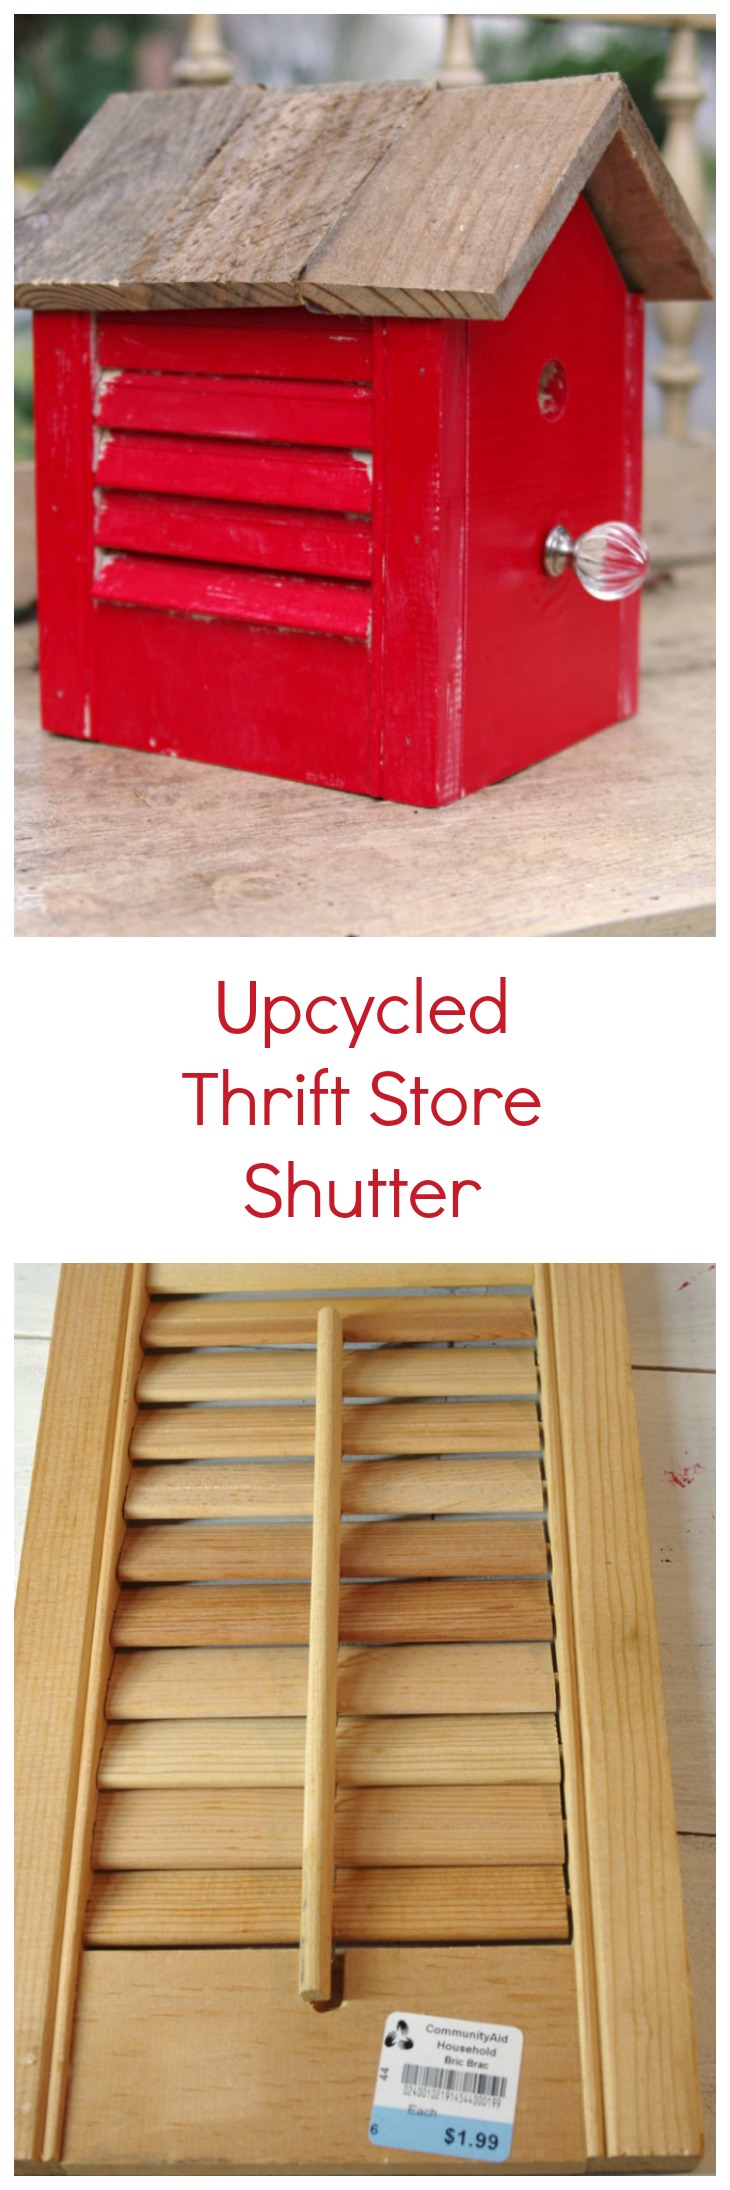 Upcycled Thrift Store Shutter